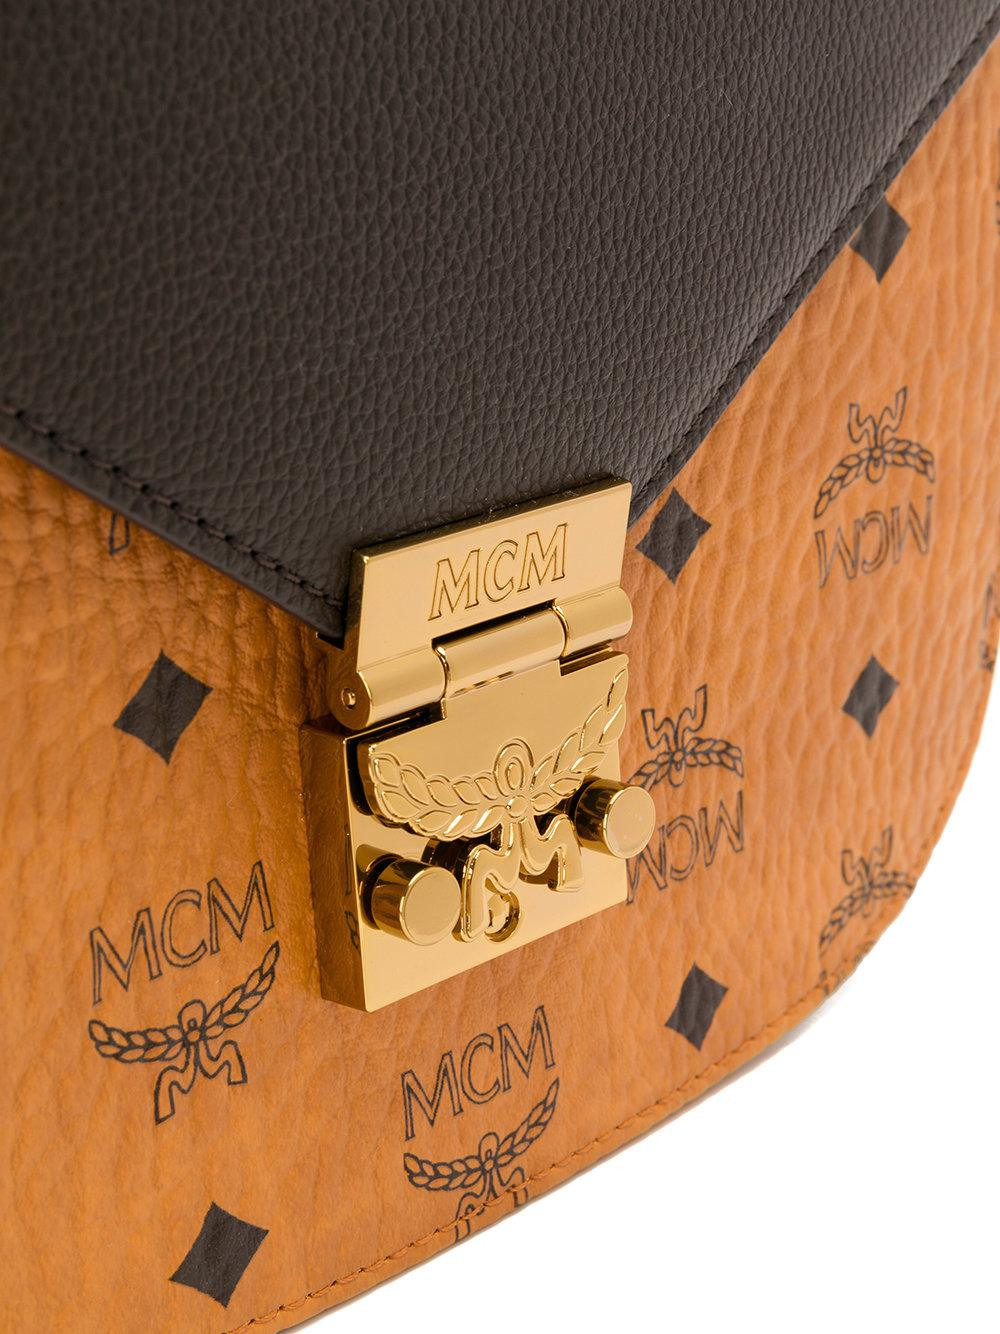 MCM Leather Monogram Print Crossbody Bag in Brown